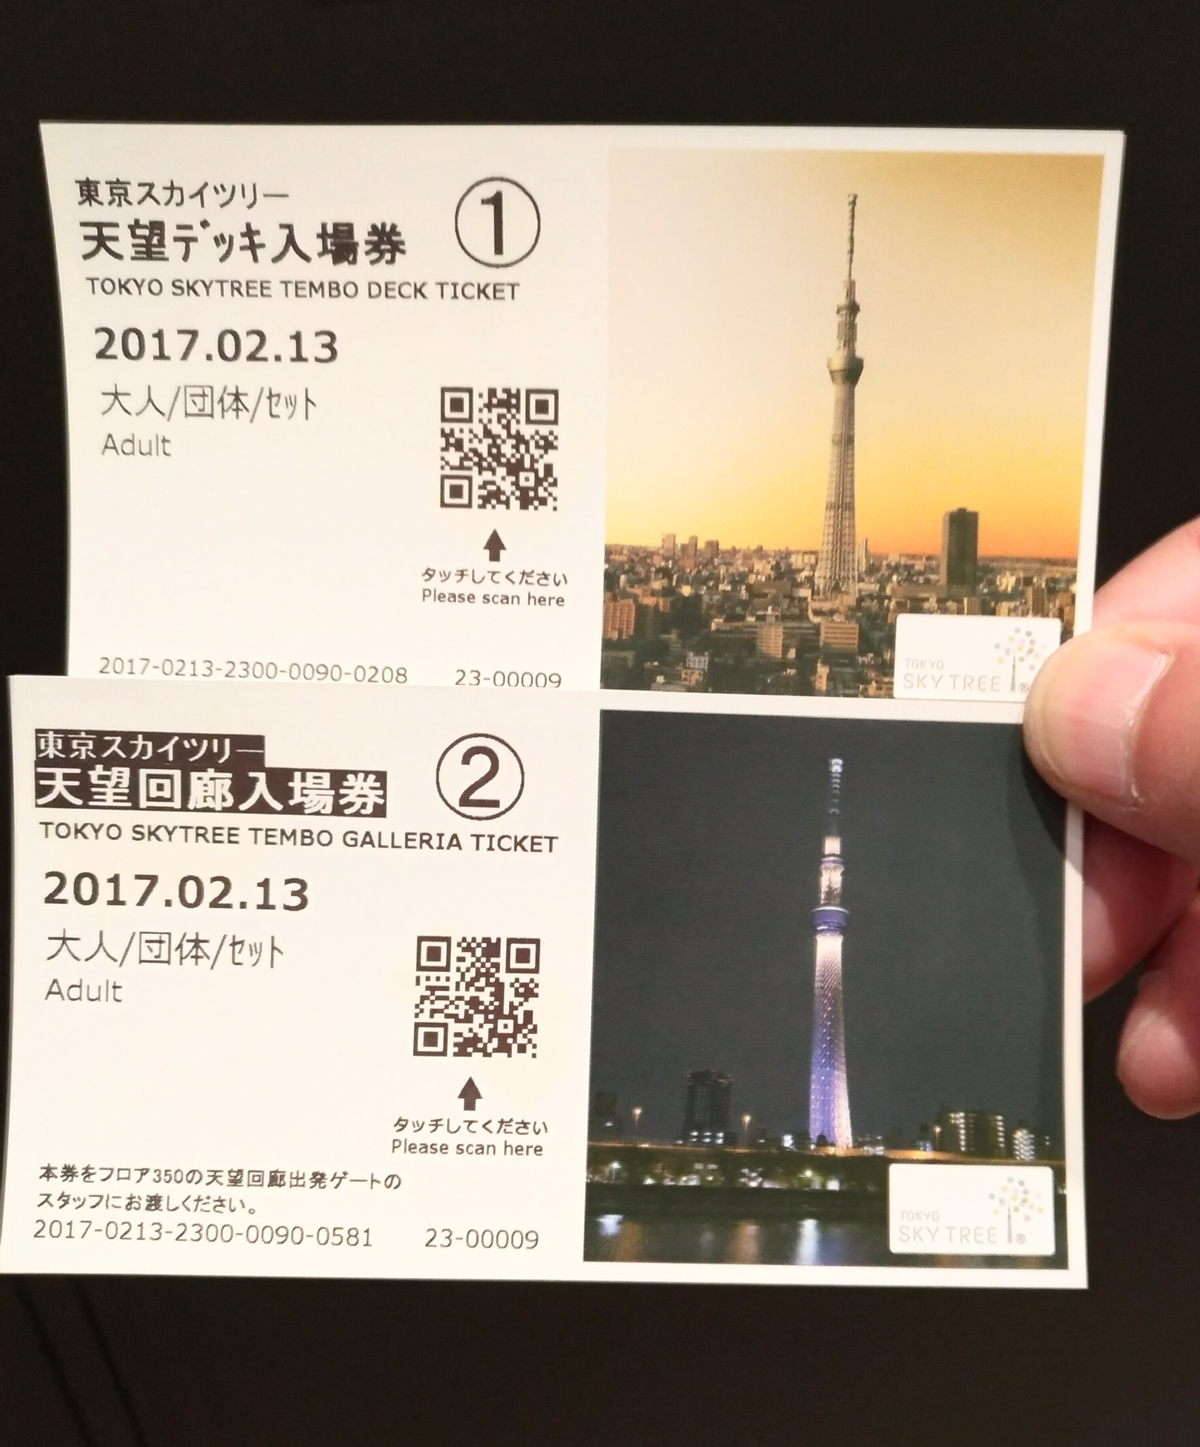 P_20170213_101649_HDR.jpg